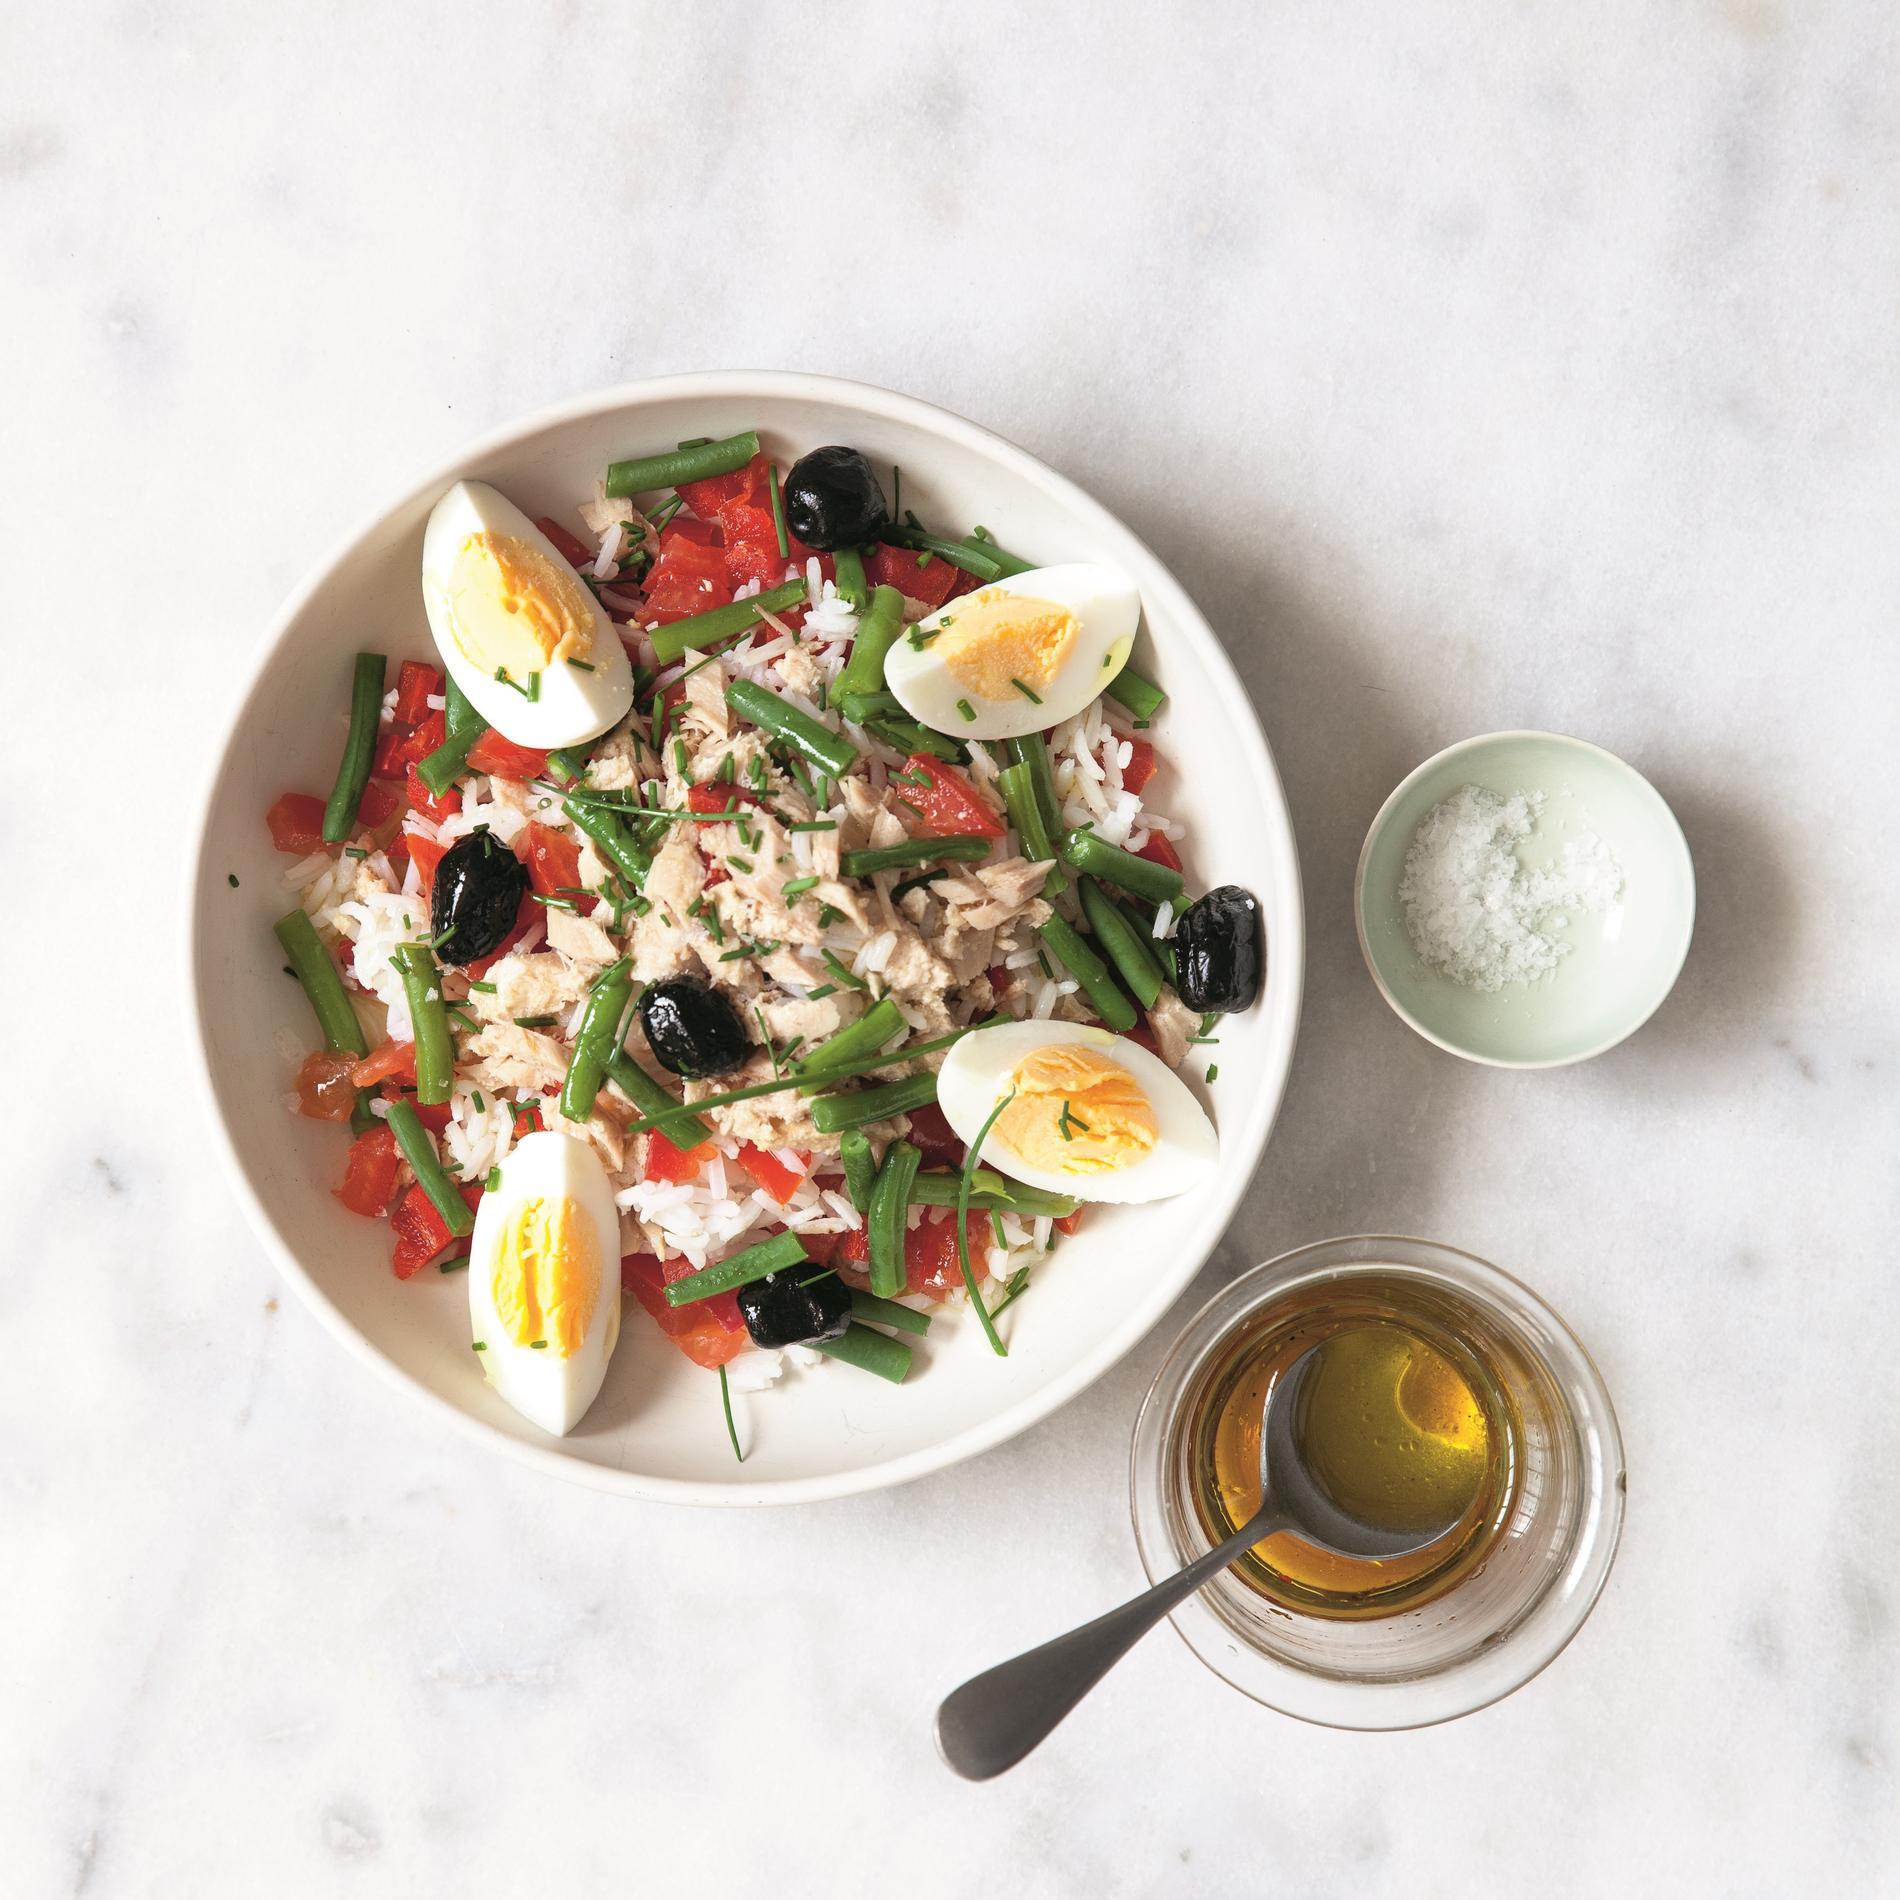 salade repas nicoise copieuse